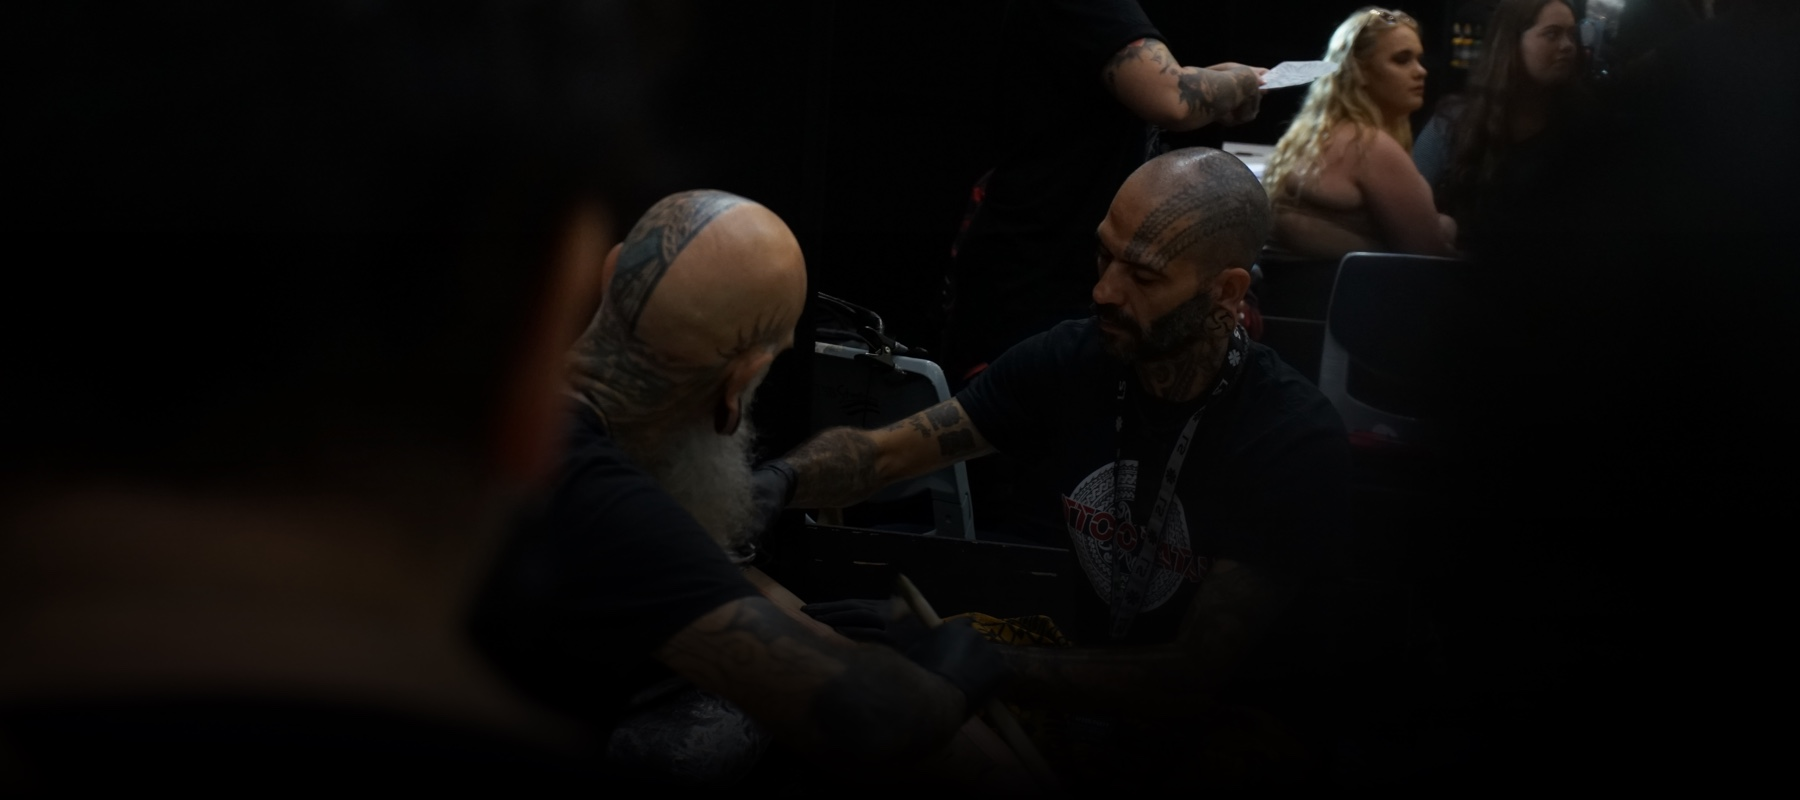 Nz Tattoo Art Festival 23 24 November New Plymouth